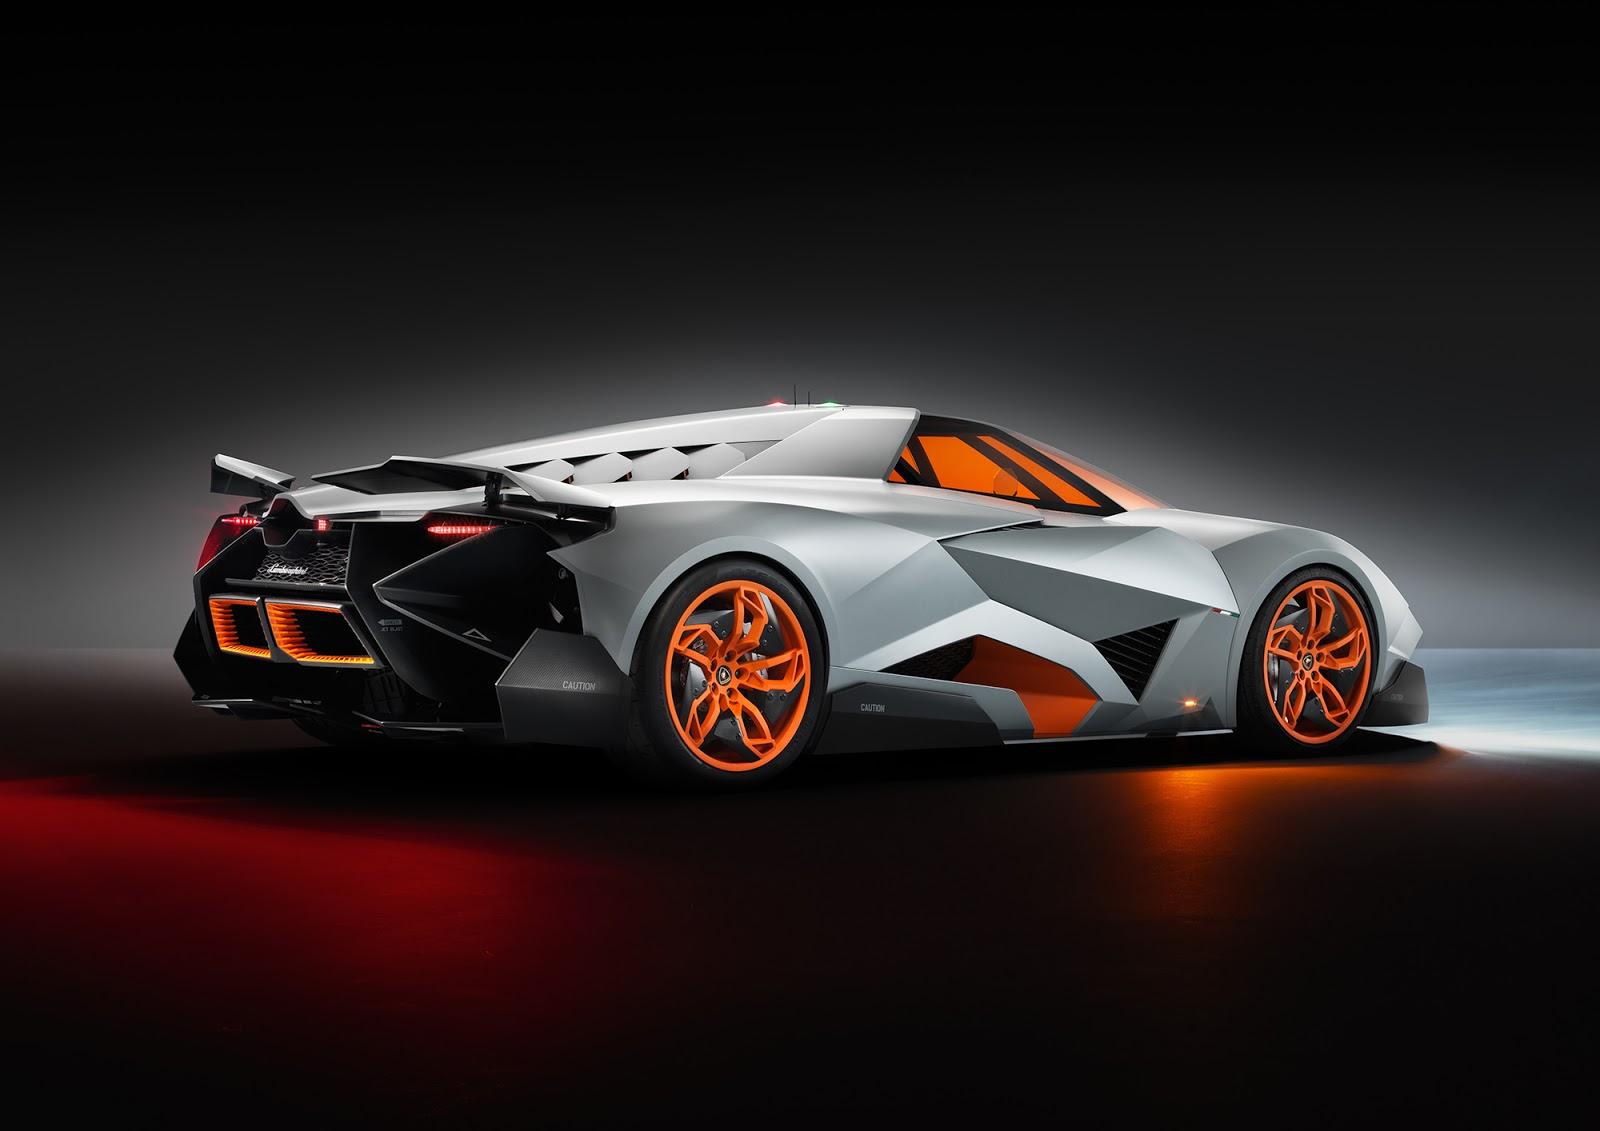 Foto Mobil Keren Lamborghini Egoista Back Side View